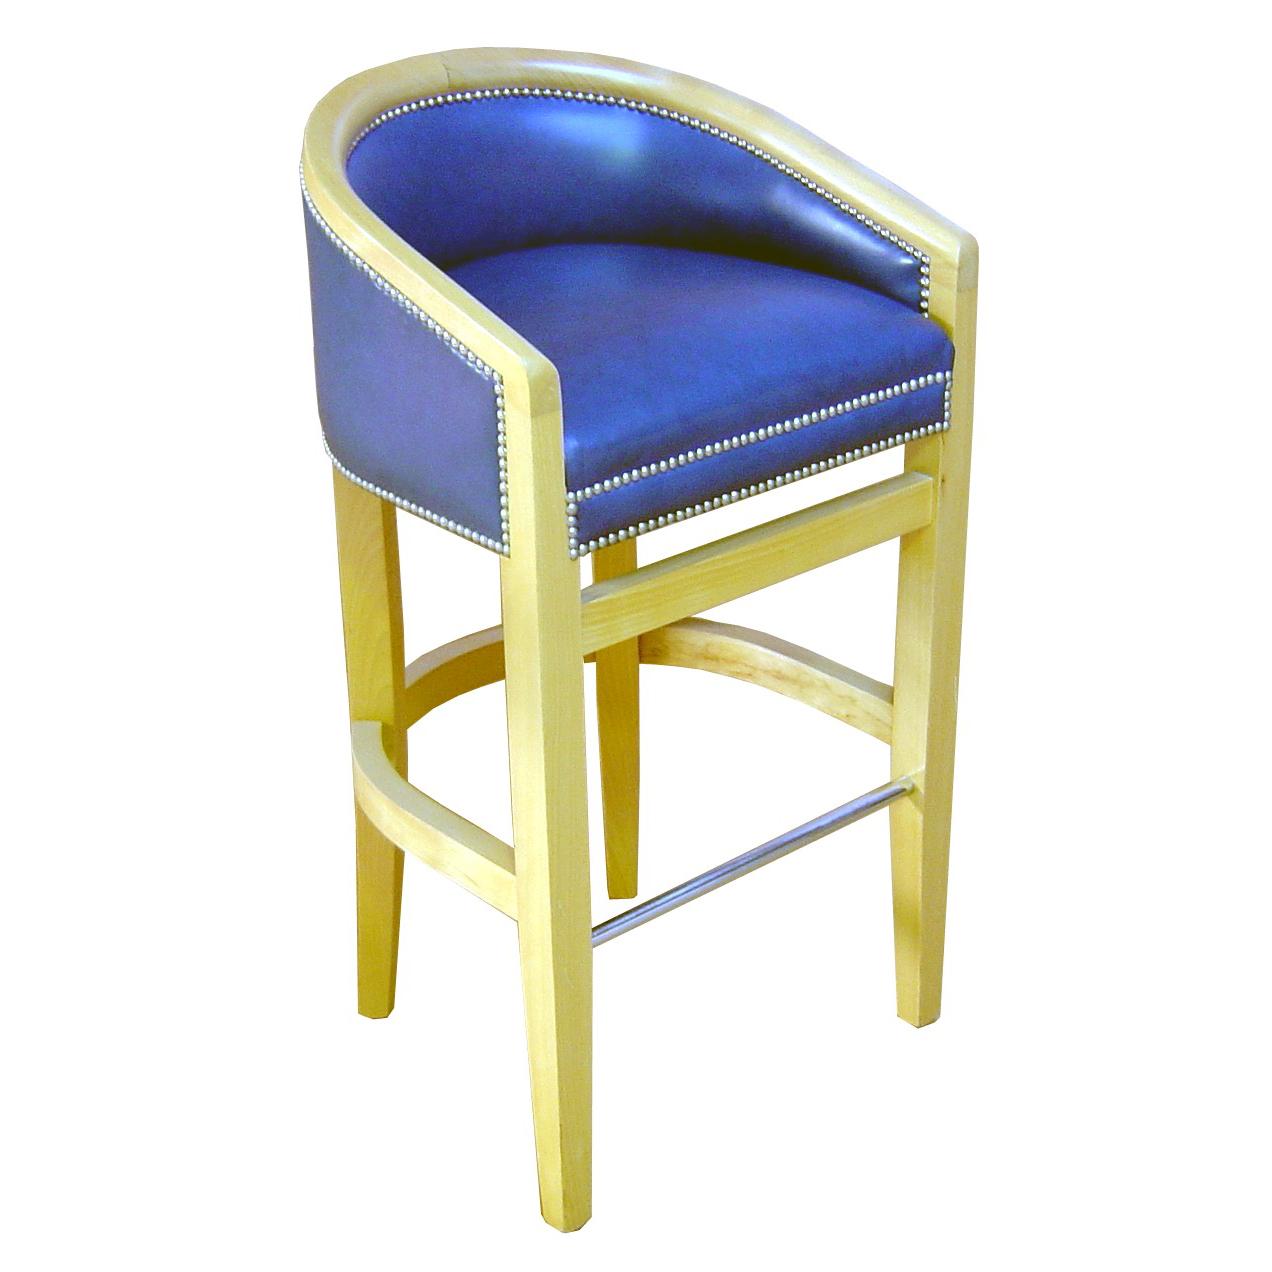 Newhaven bar stool Handmade in UK Chairmaker : New Haven bar stool1 from www.chairmaker.co.uk size 1272 x 1272 jpeg 514kB